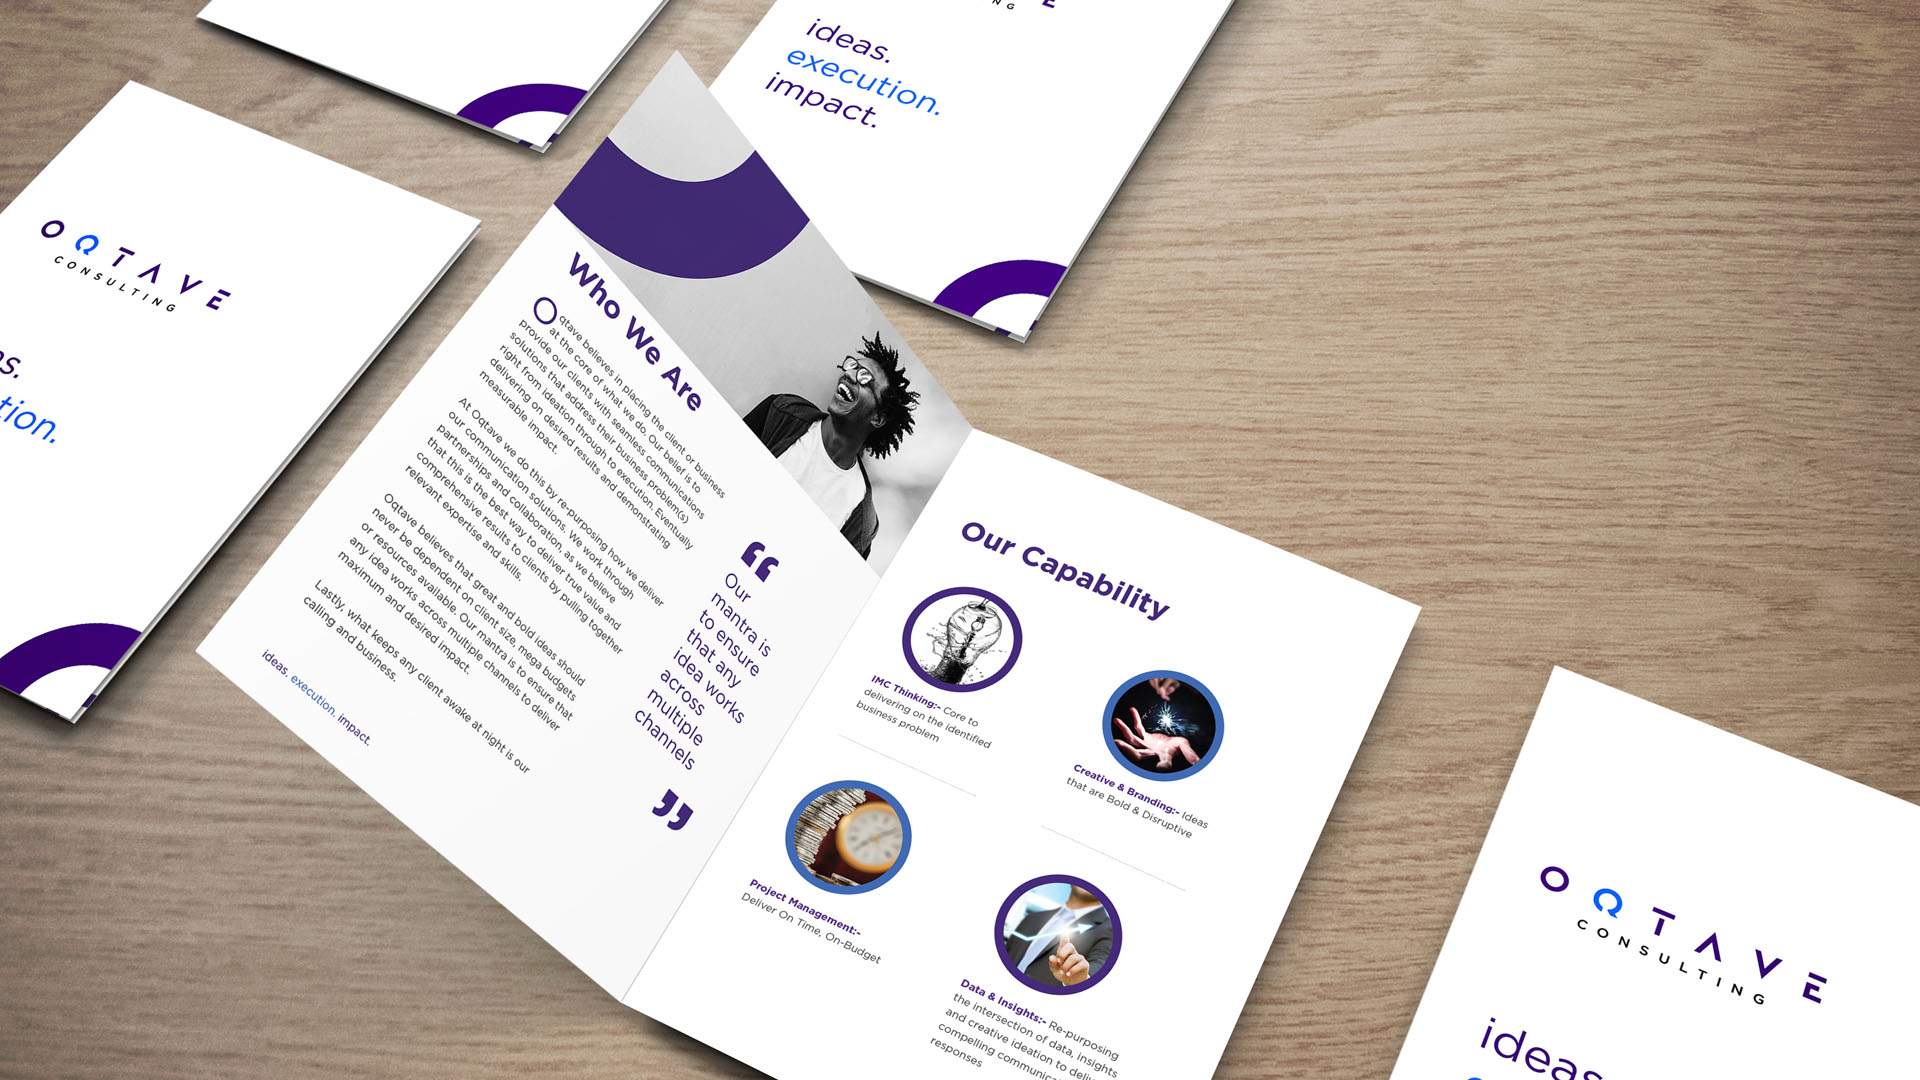 Oqtave Consulting Deigned by Jabari Creative Studios